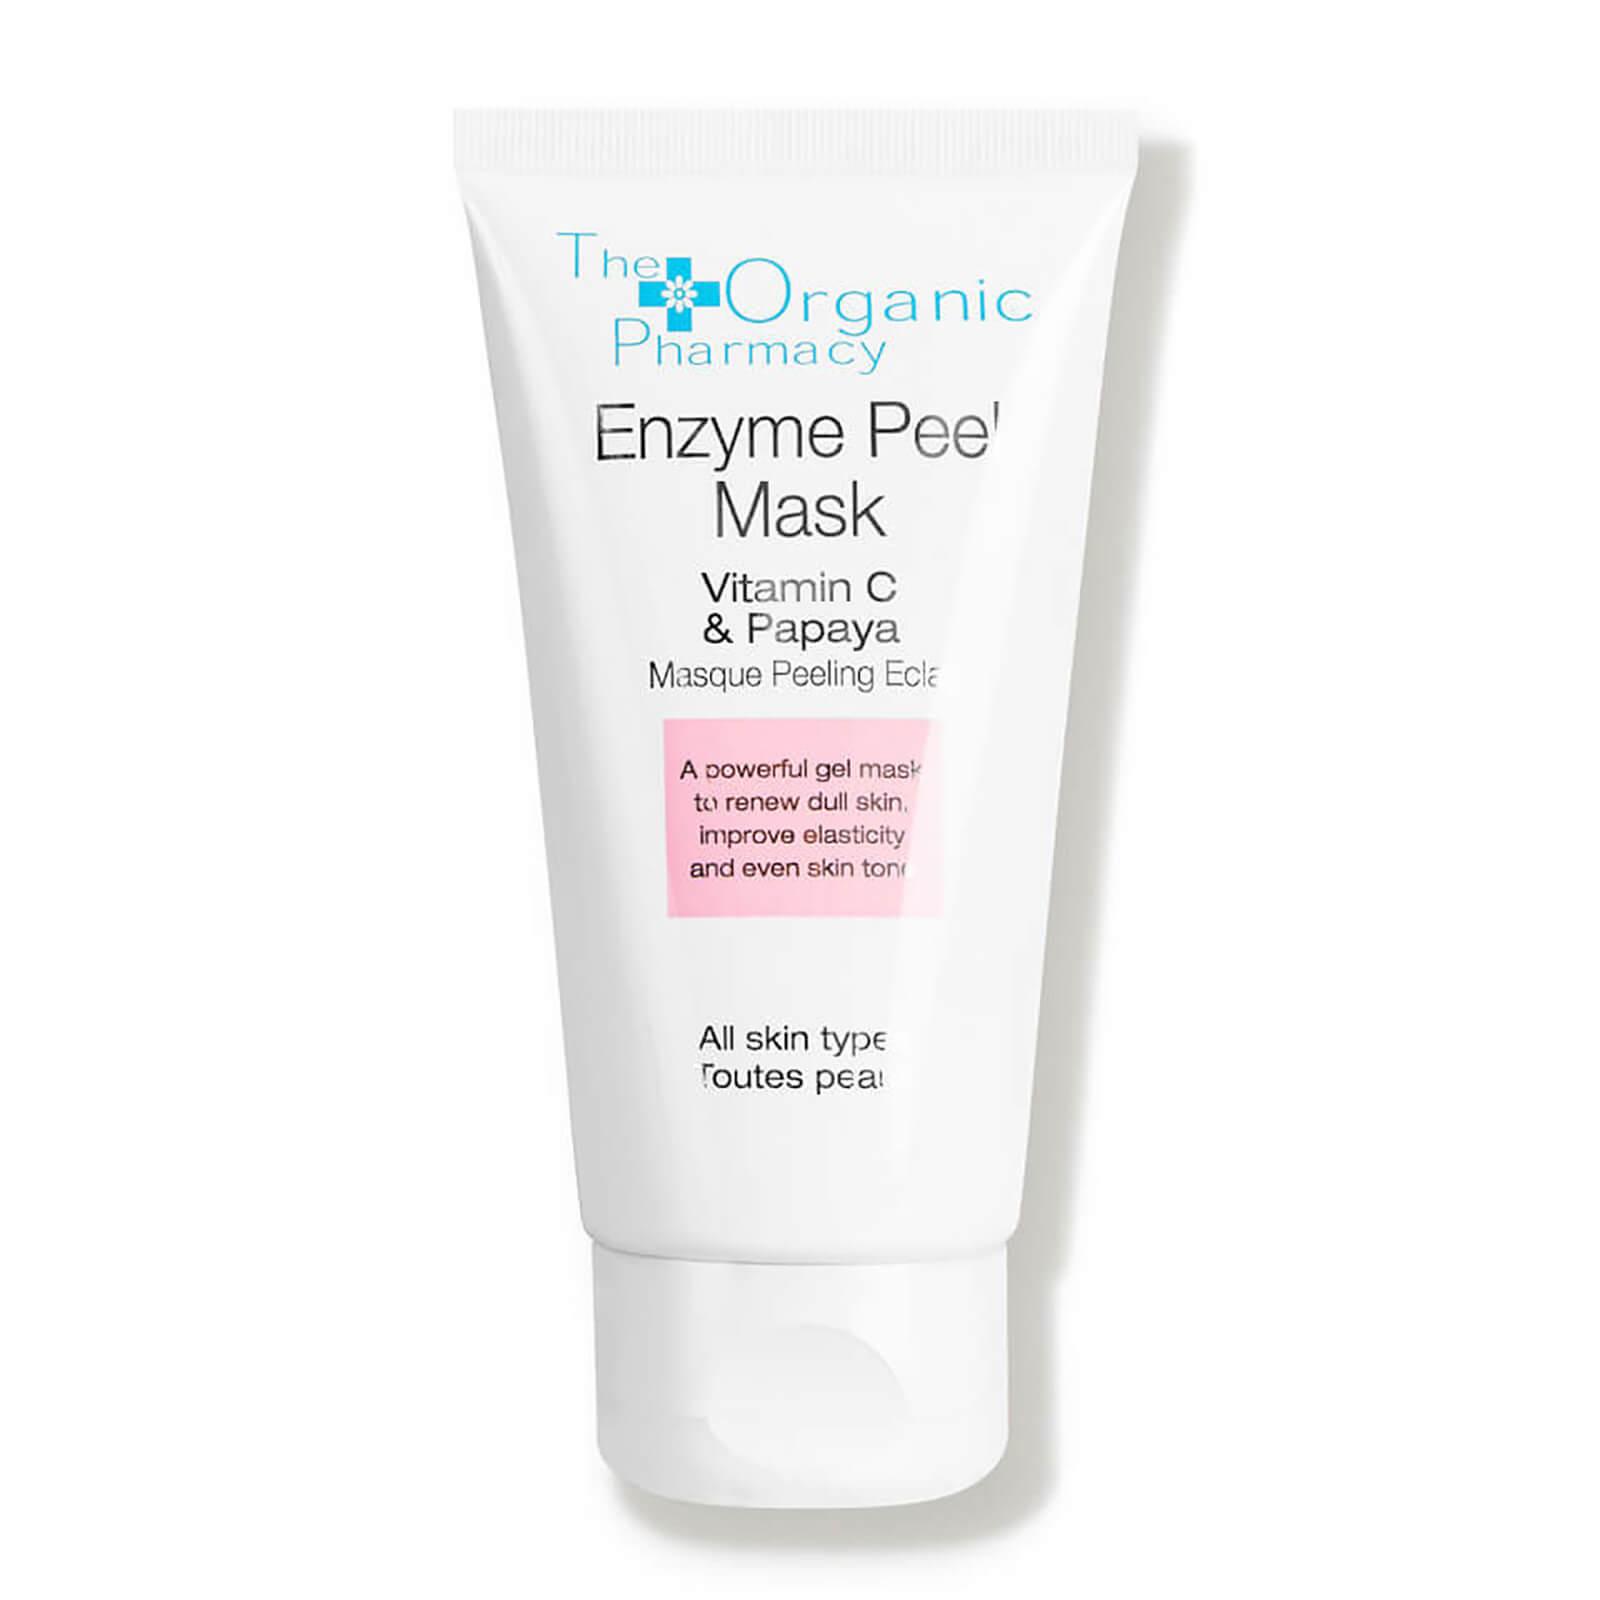 the organic pharmacy enzyme peel mask with vitamin c and papaya 60ml